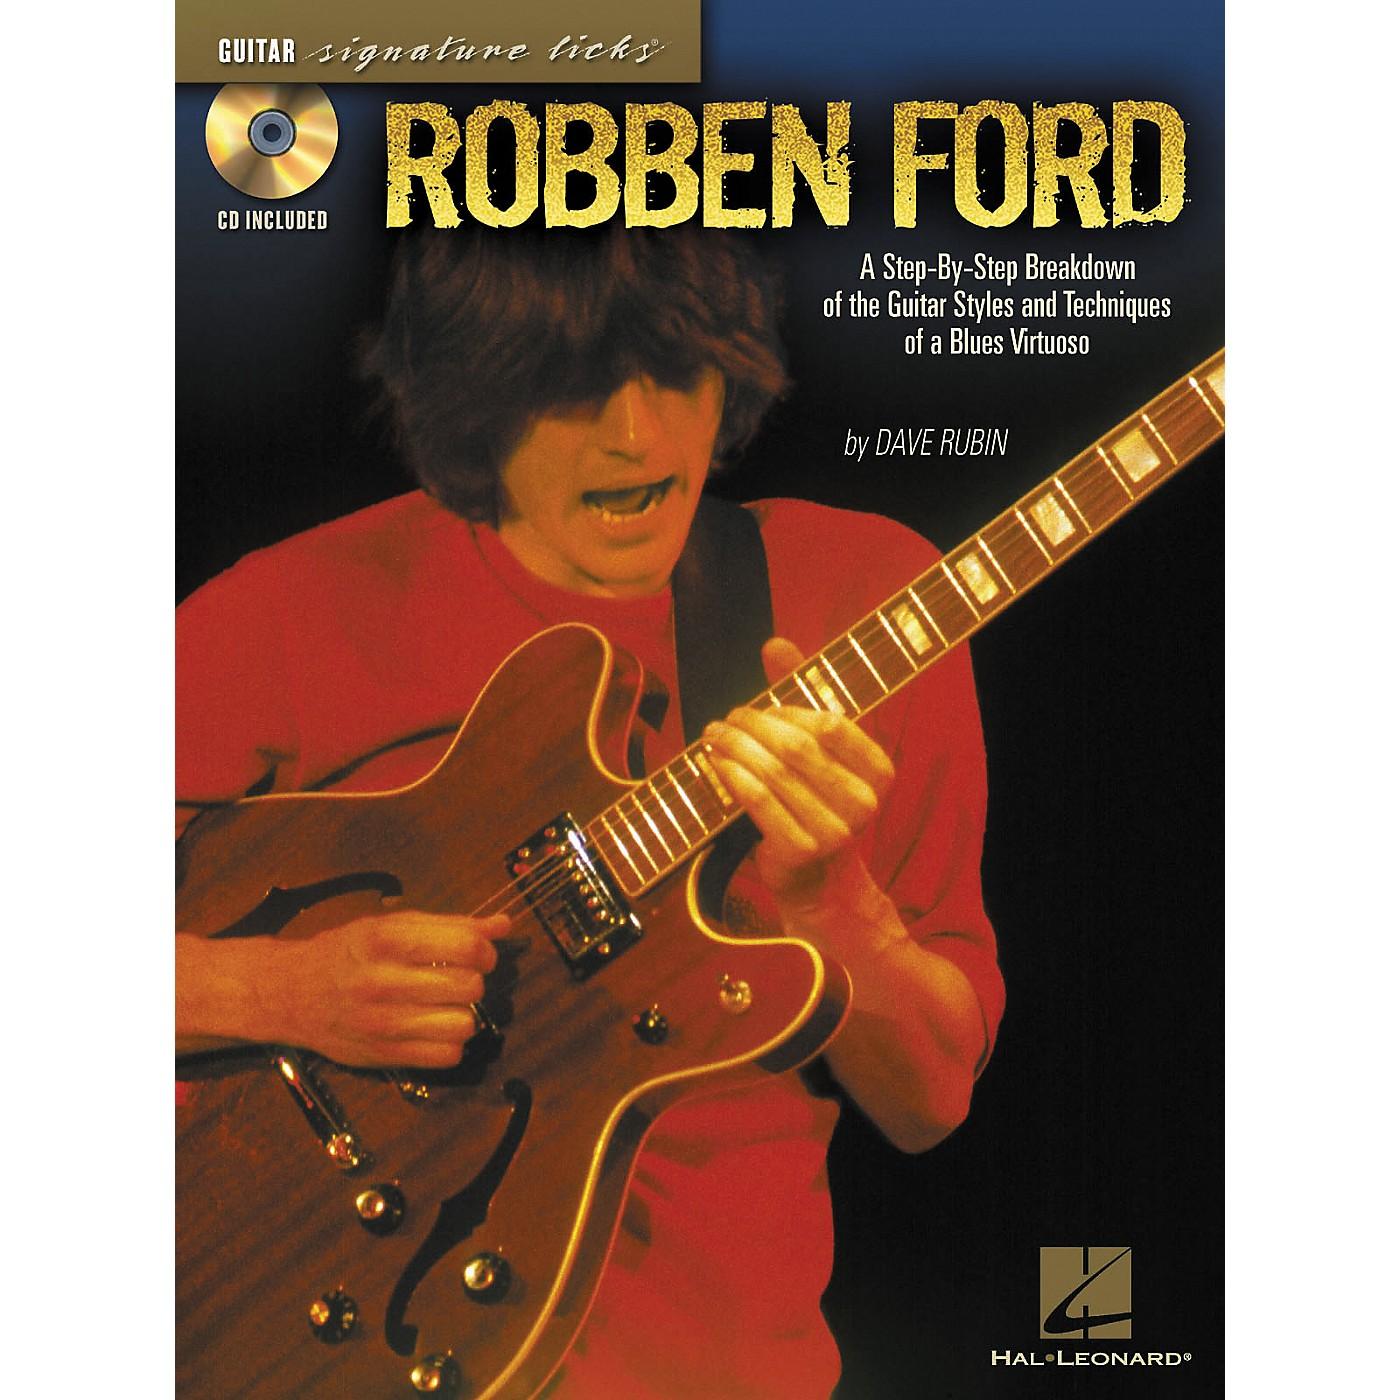 Hal Leonard Robben ford Signature Licks Book & CD thumbnail